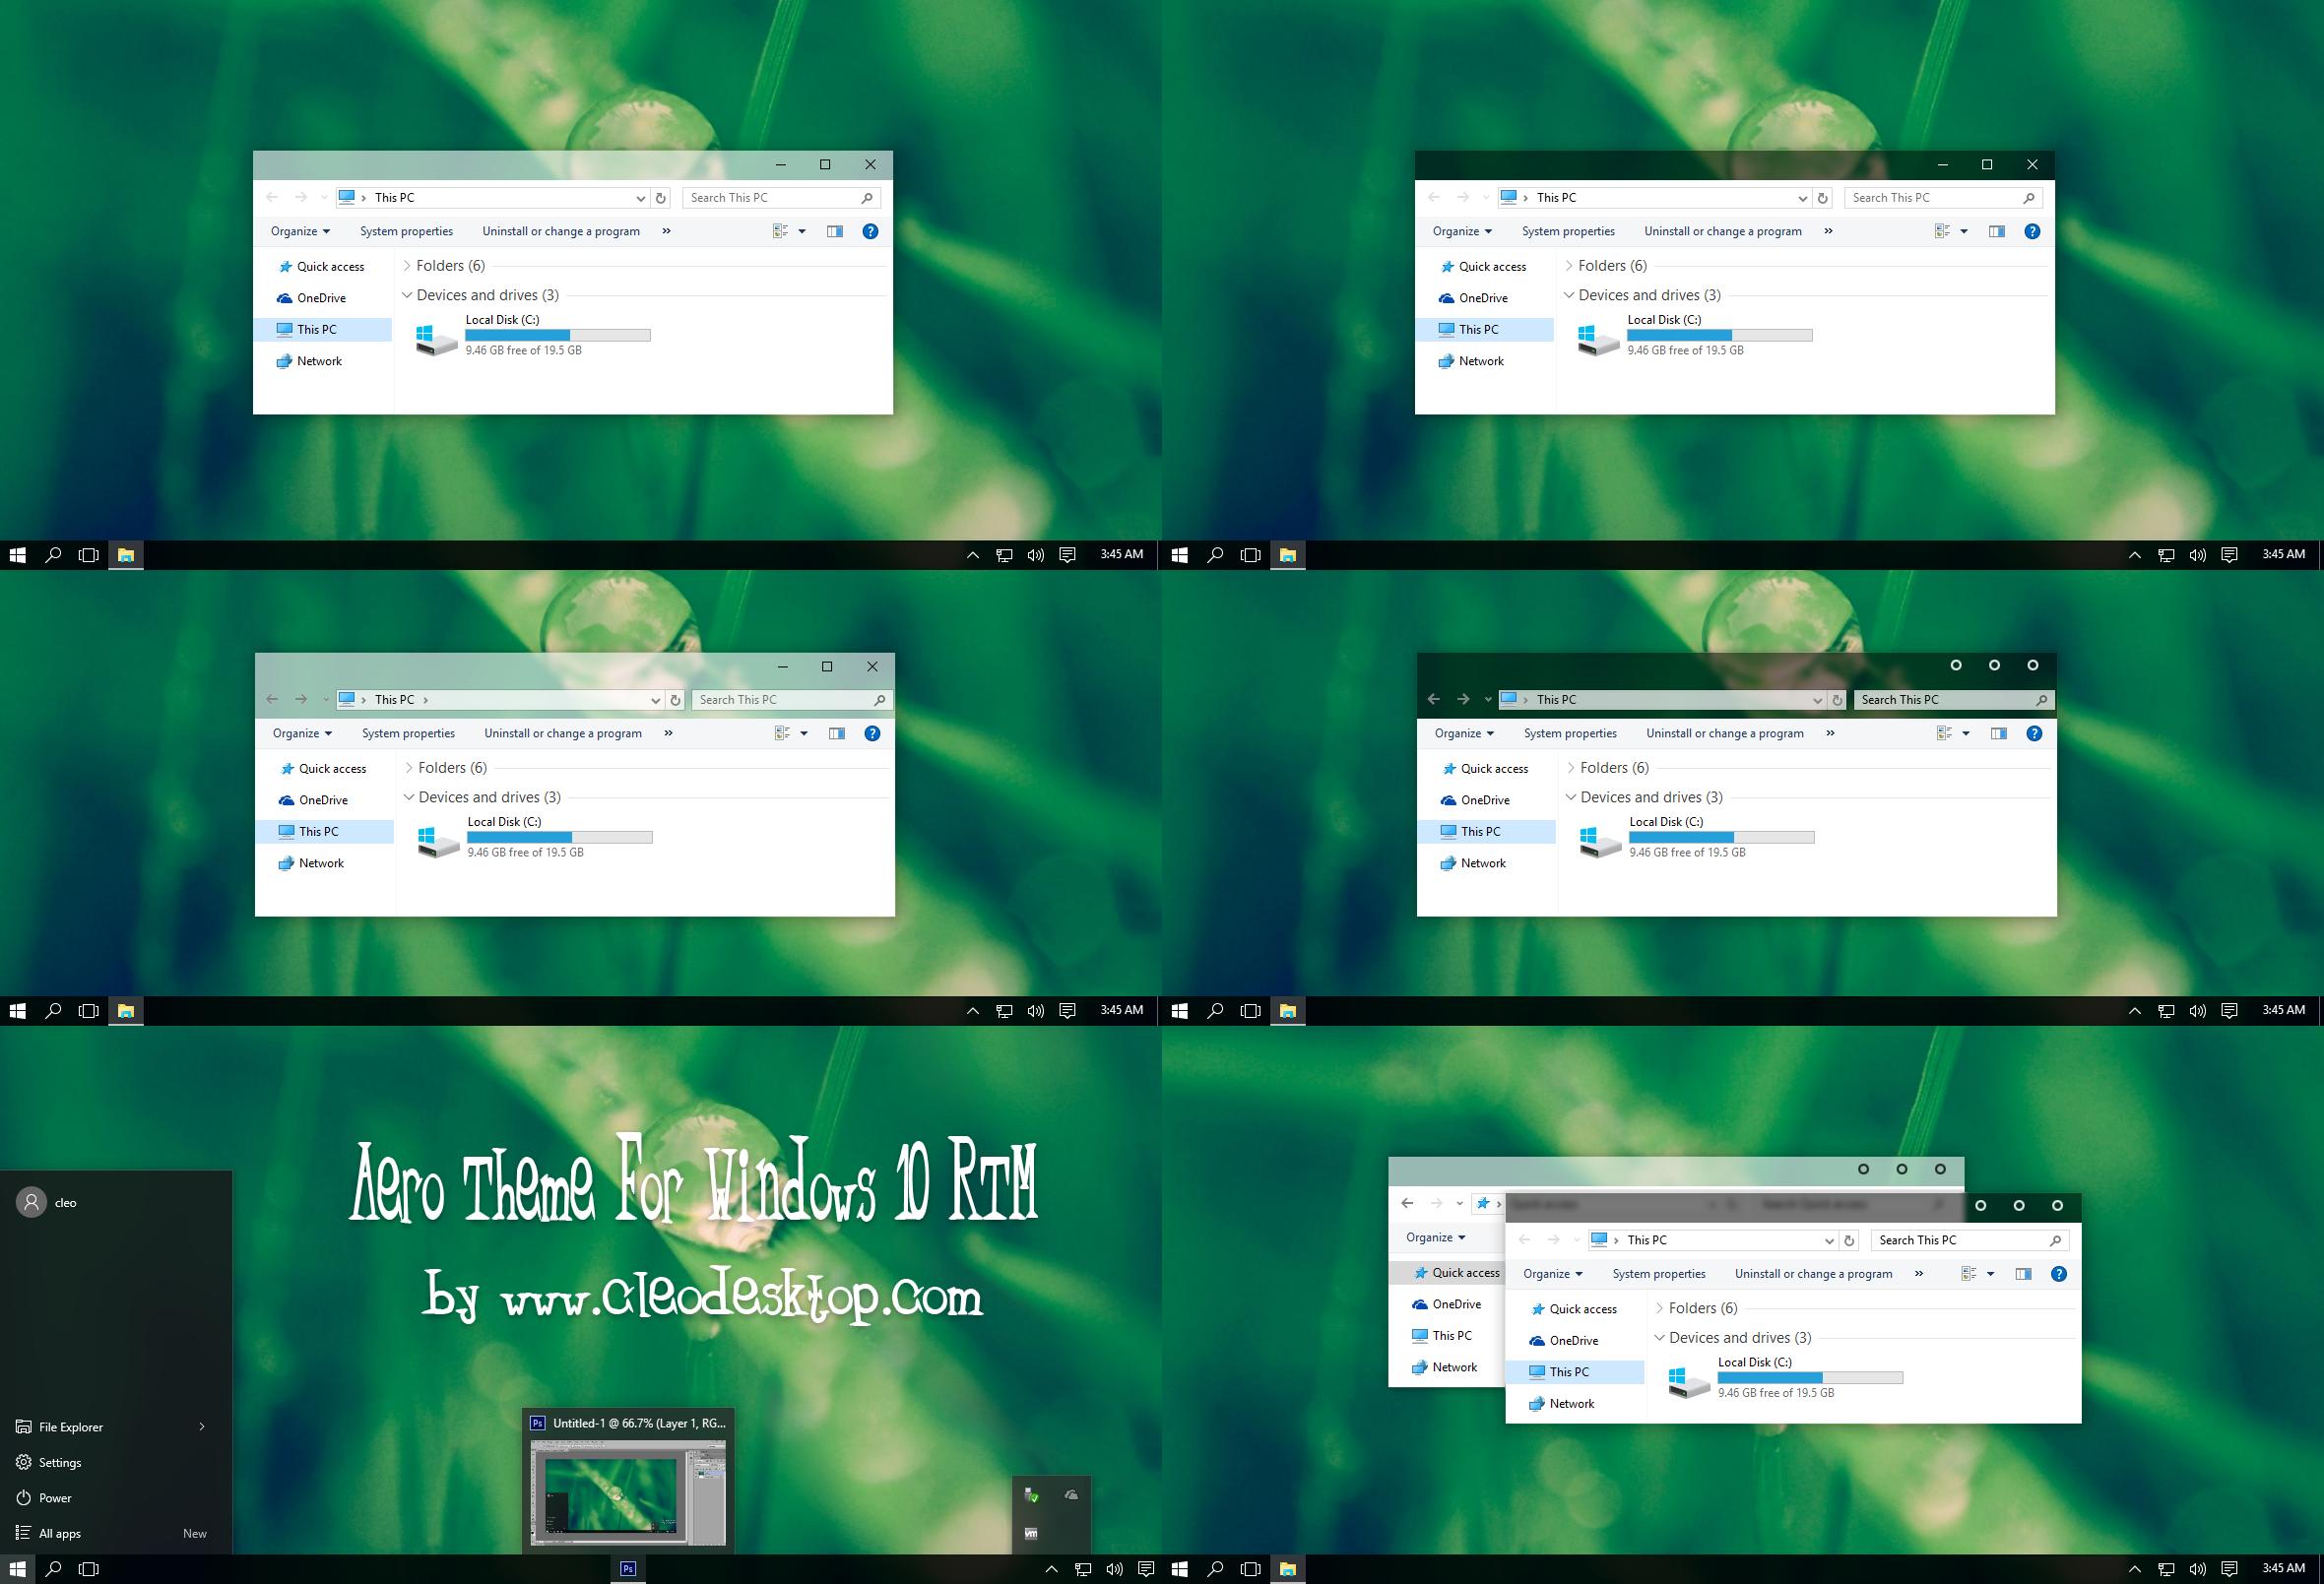 Aero Theme Trong Suốt Cho Windows 10 RTM | Tinhte vn